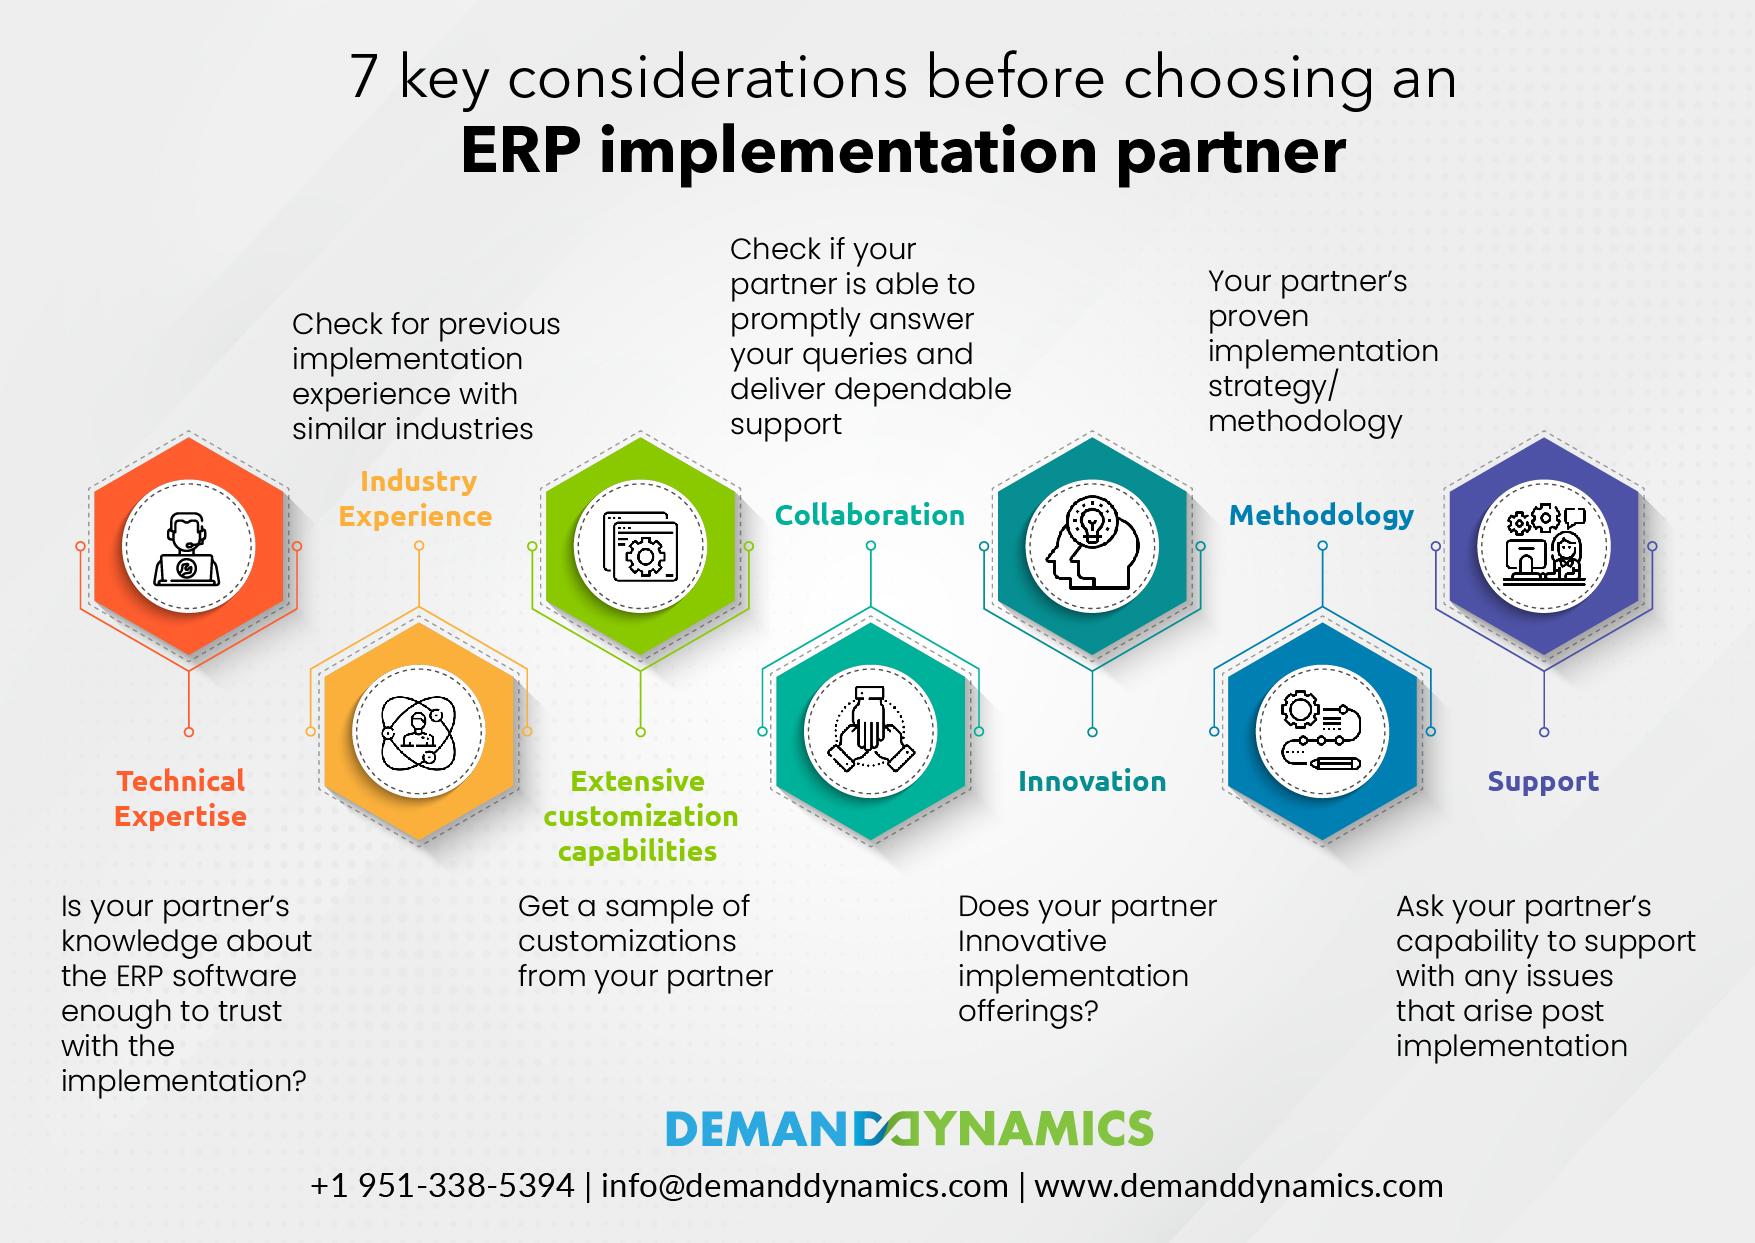 Considerations Before Choosing an ERP Implementation Partner